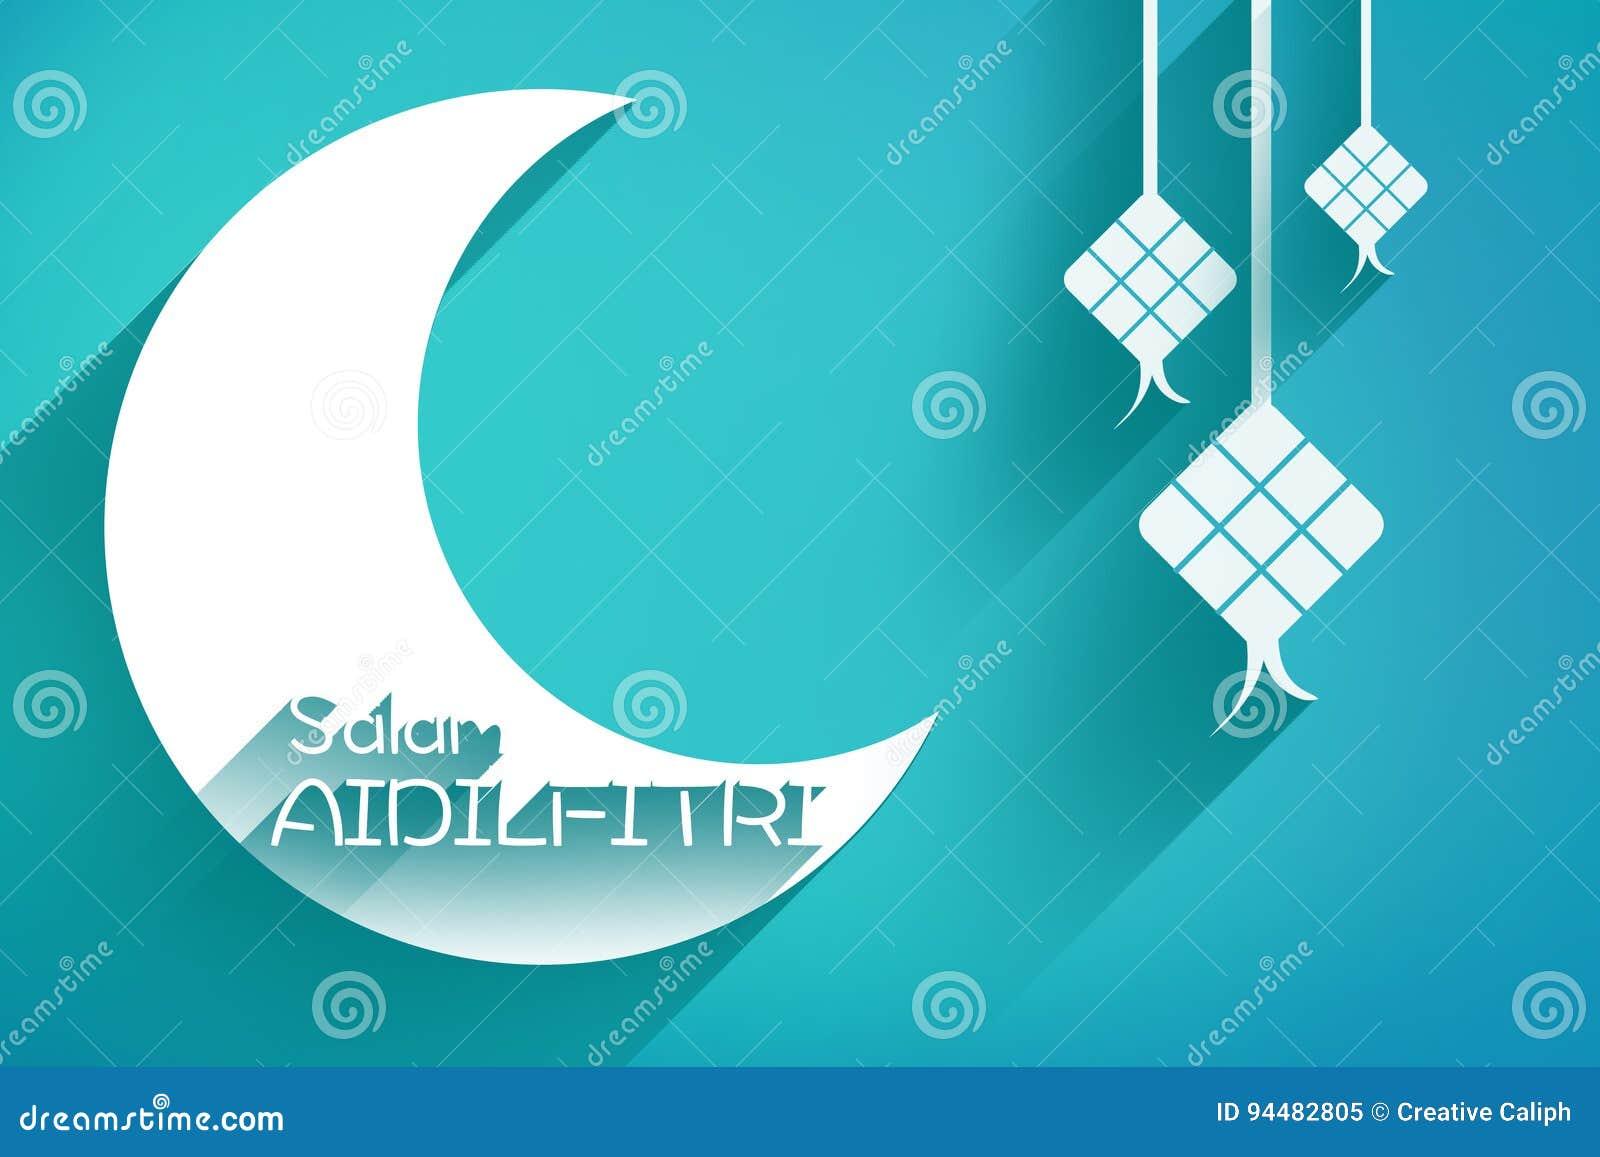 Raya eid greeting card stock illustration illustration of greeting raya eid greeting card break idulfitri kristyandbryce Images